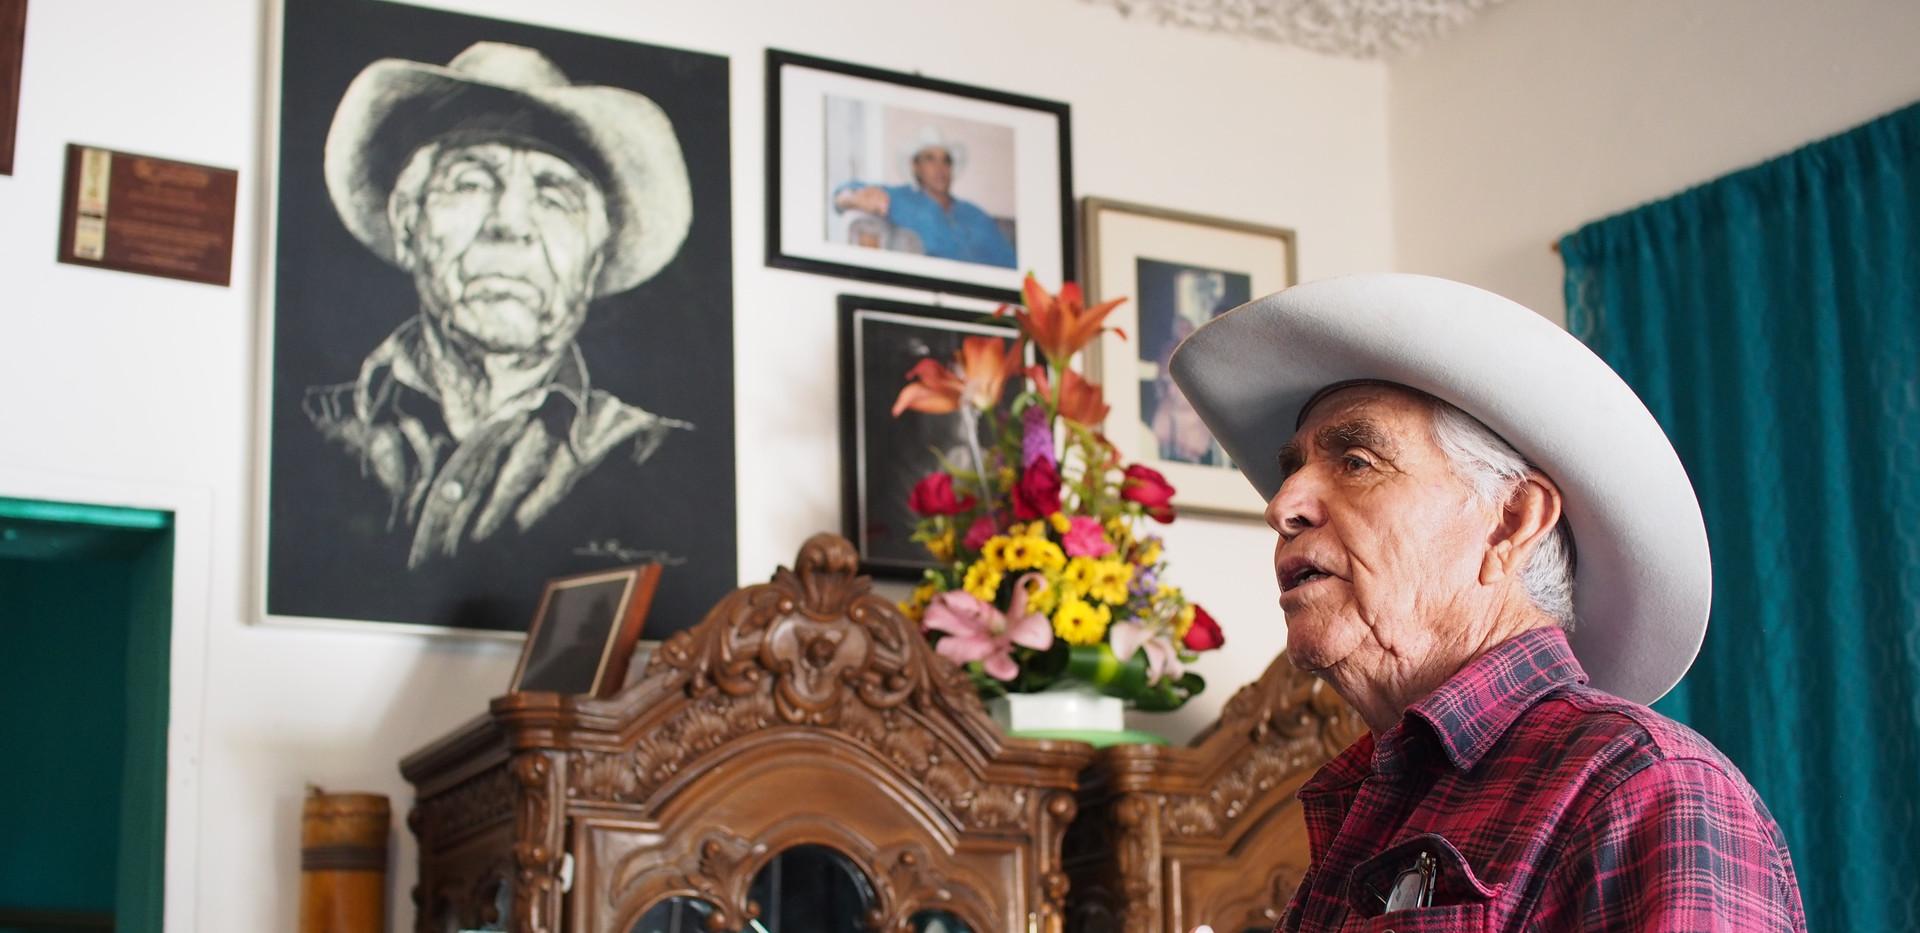 Juan Quezada by Andrea Calleros